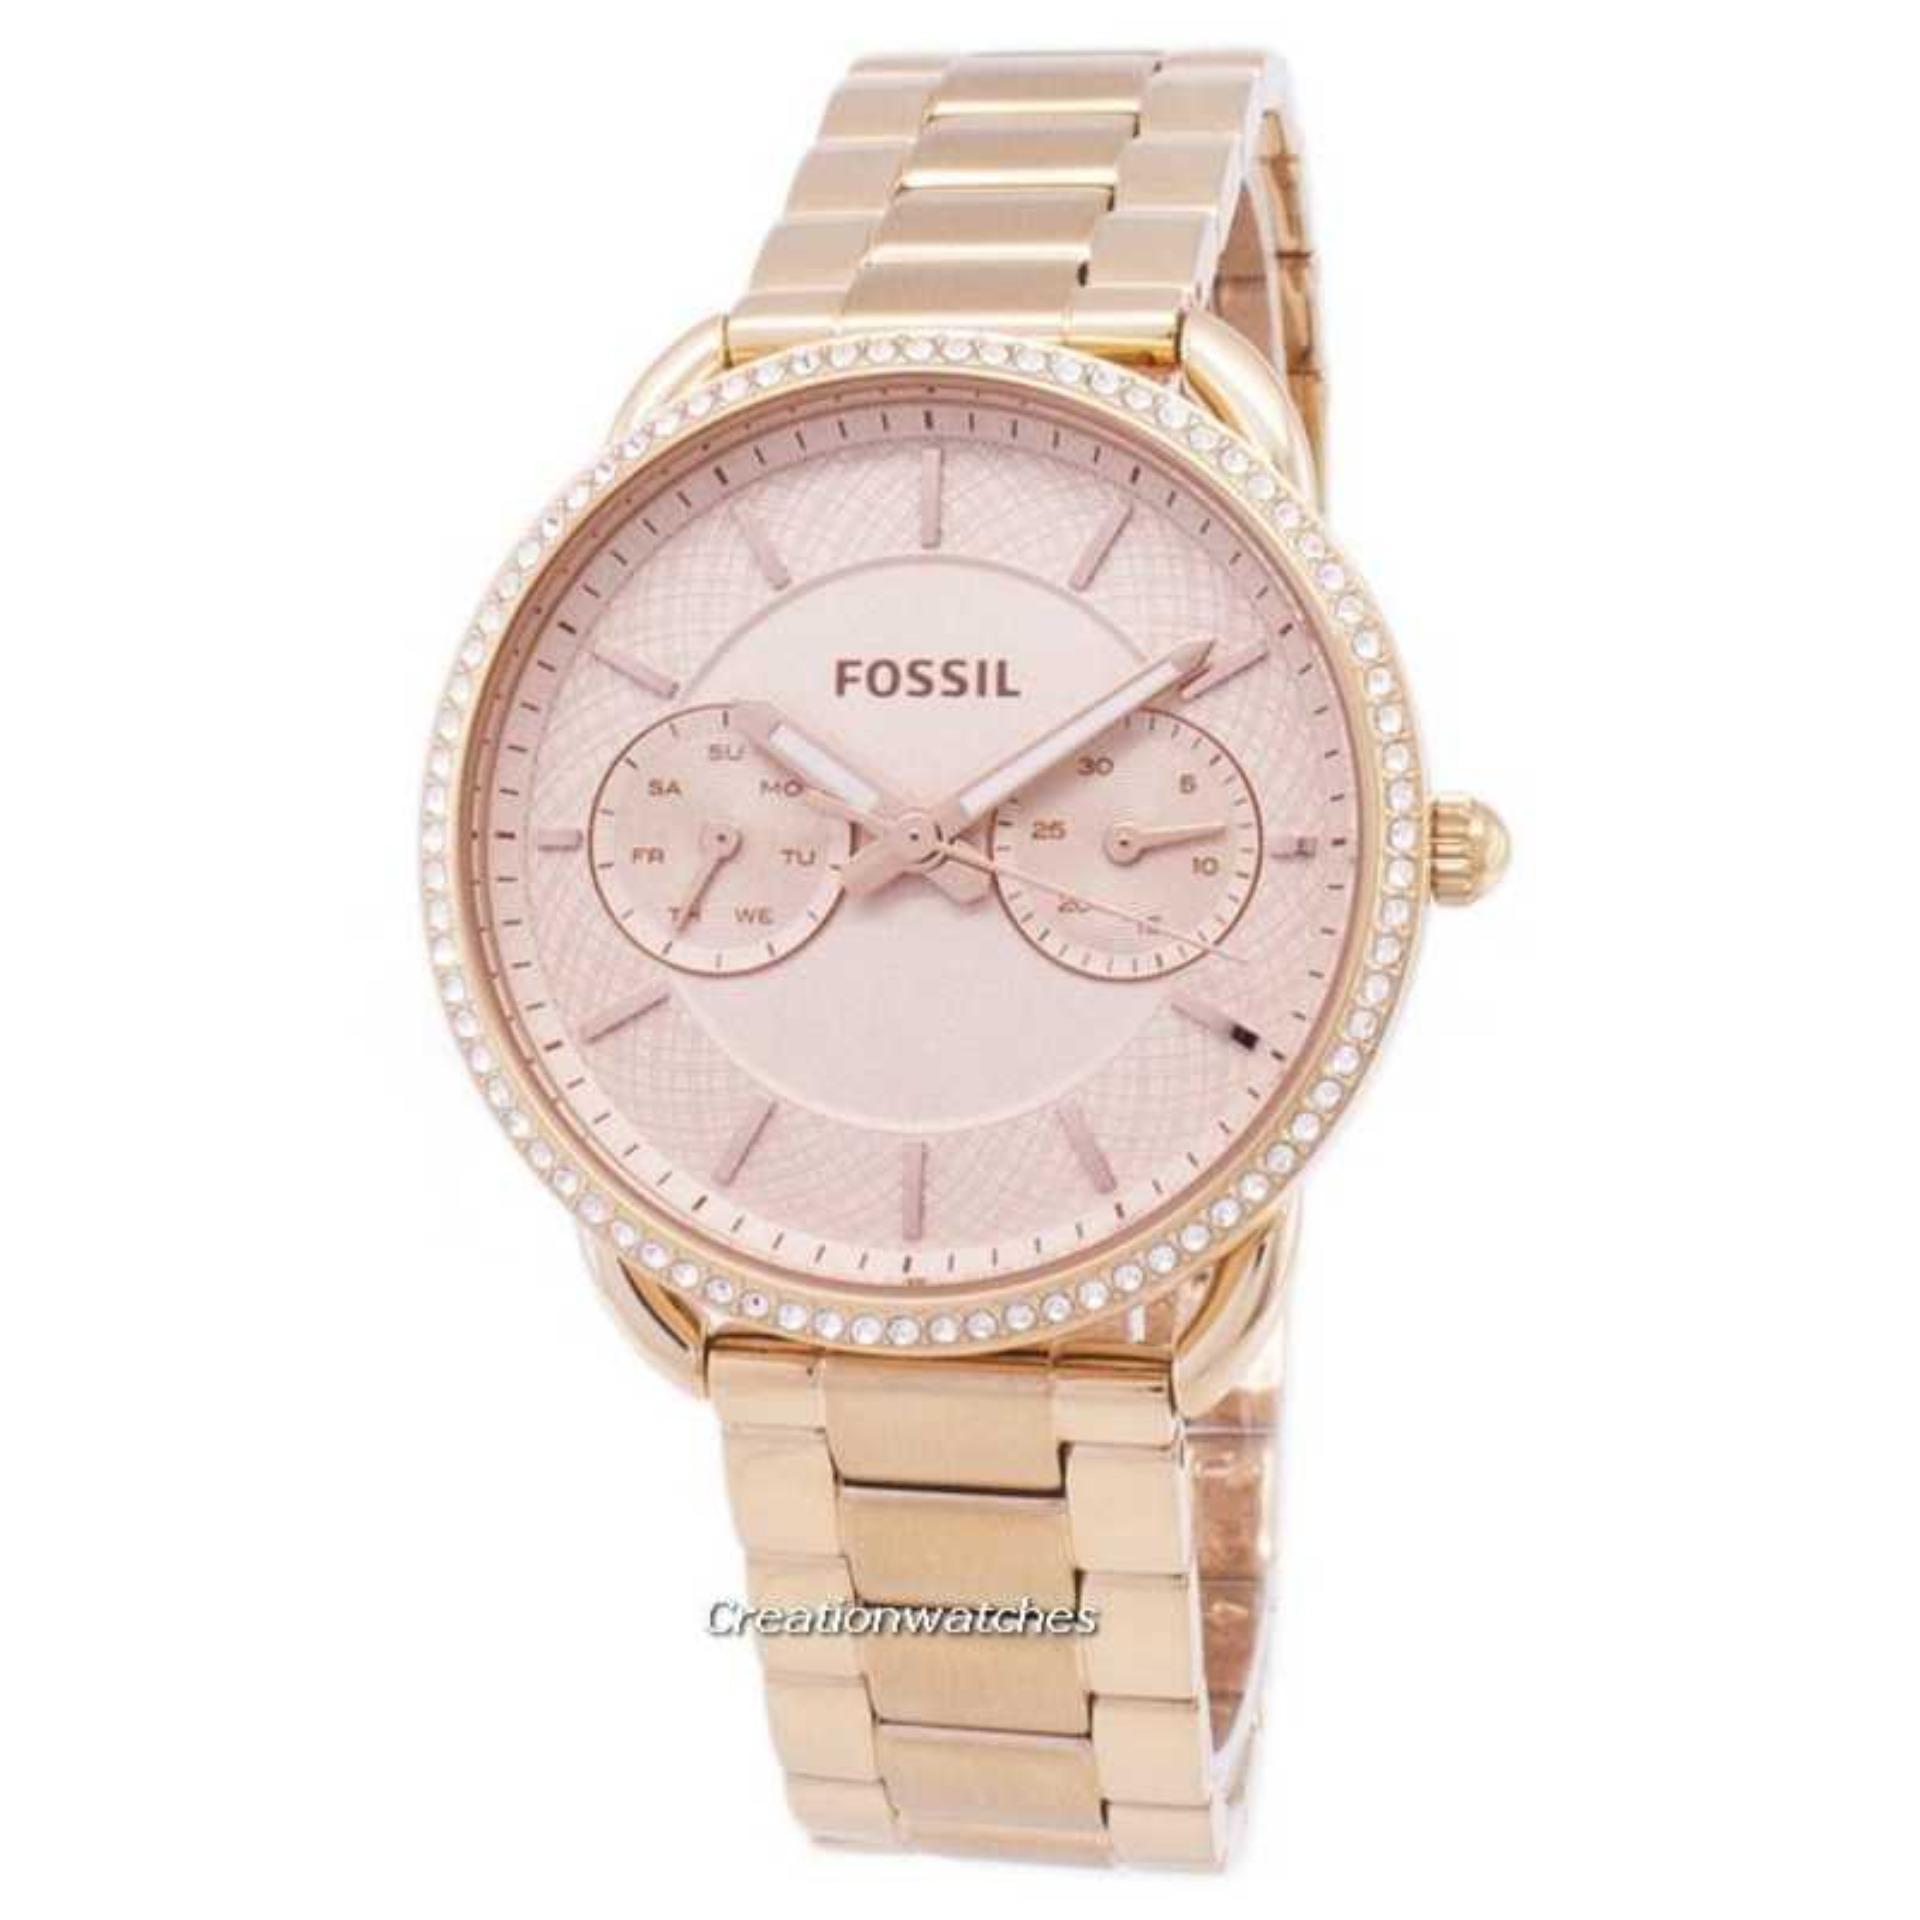 941836ece96 Fossil Tailor Multifunction Quartz Diamond Accents Women's Rose Gold  Stainless Steel Bracelet Watch ES4264